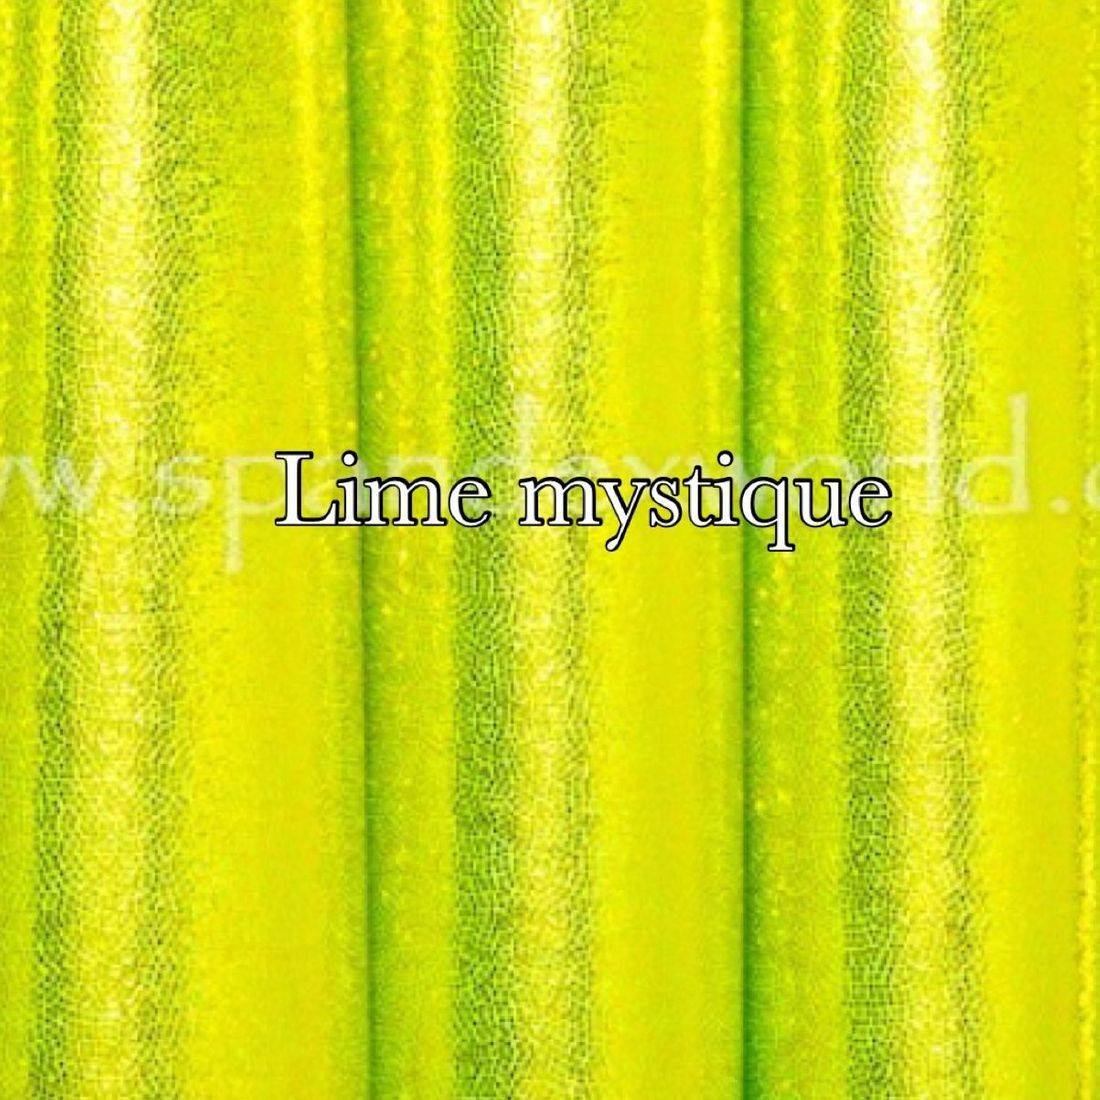 Fluorescent lime mist